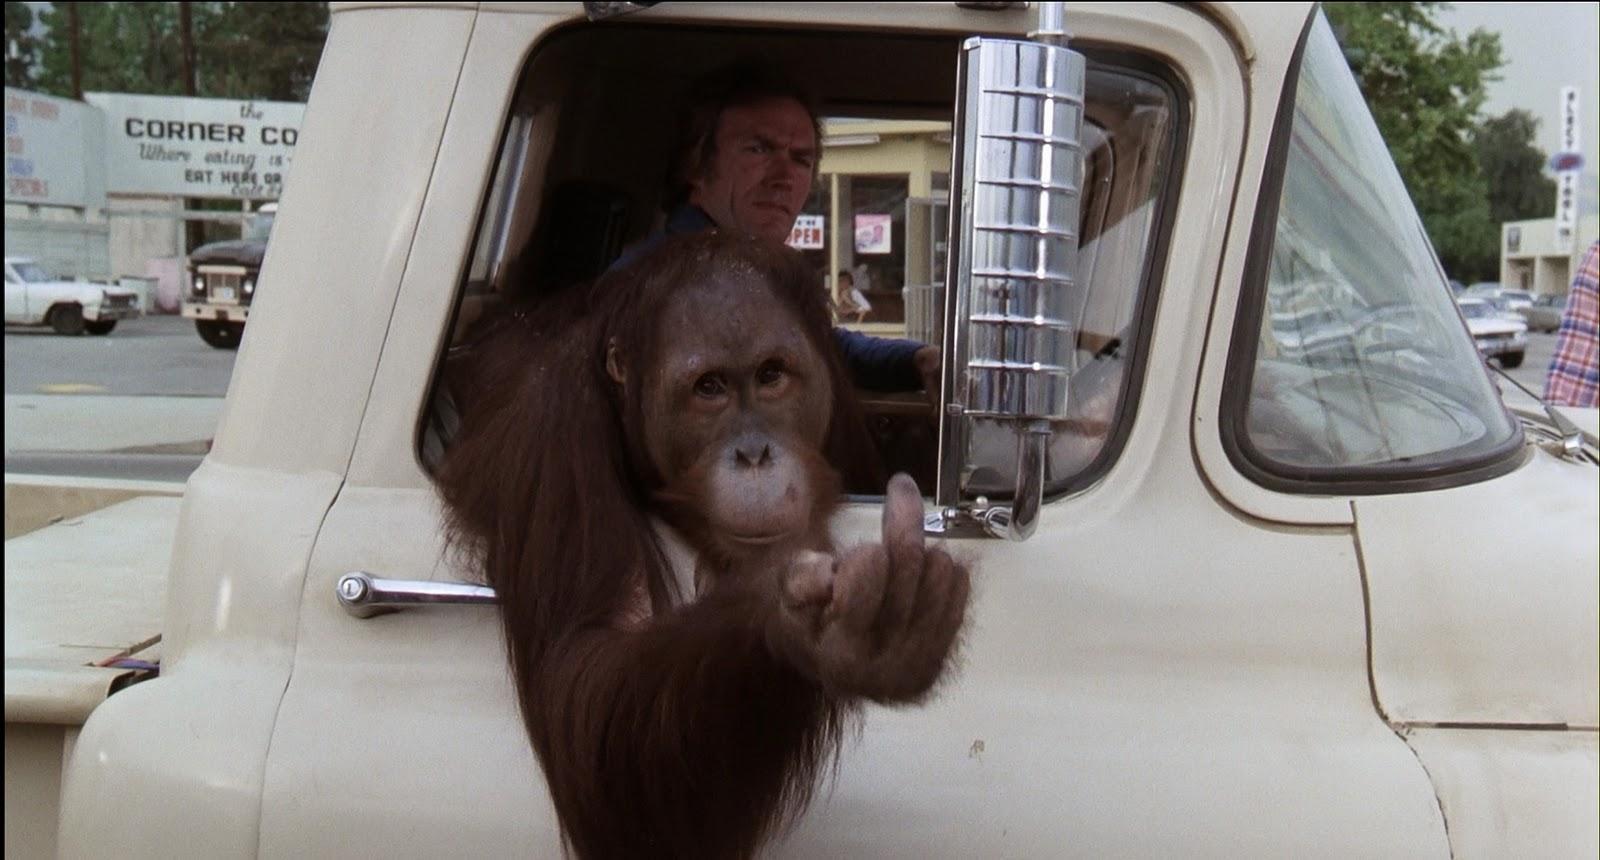 http://3.bp.blogspot.com/_Y5-4Z4aPcOI/TTM6yjE7HwI/AAAAAAAAAHQ/s1aY8Lu3_l8/s1600/funny+monkey.jpg